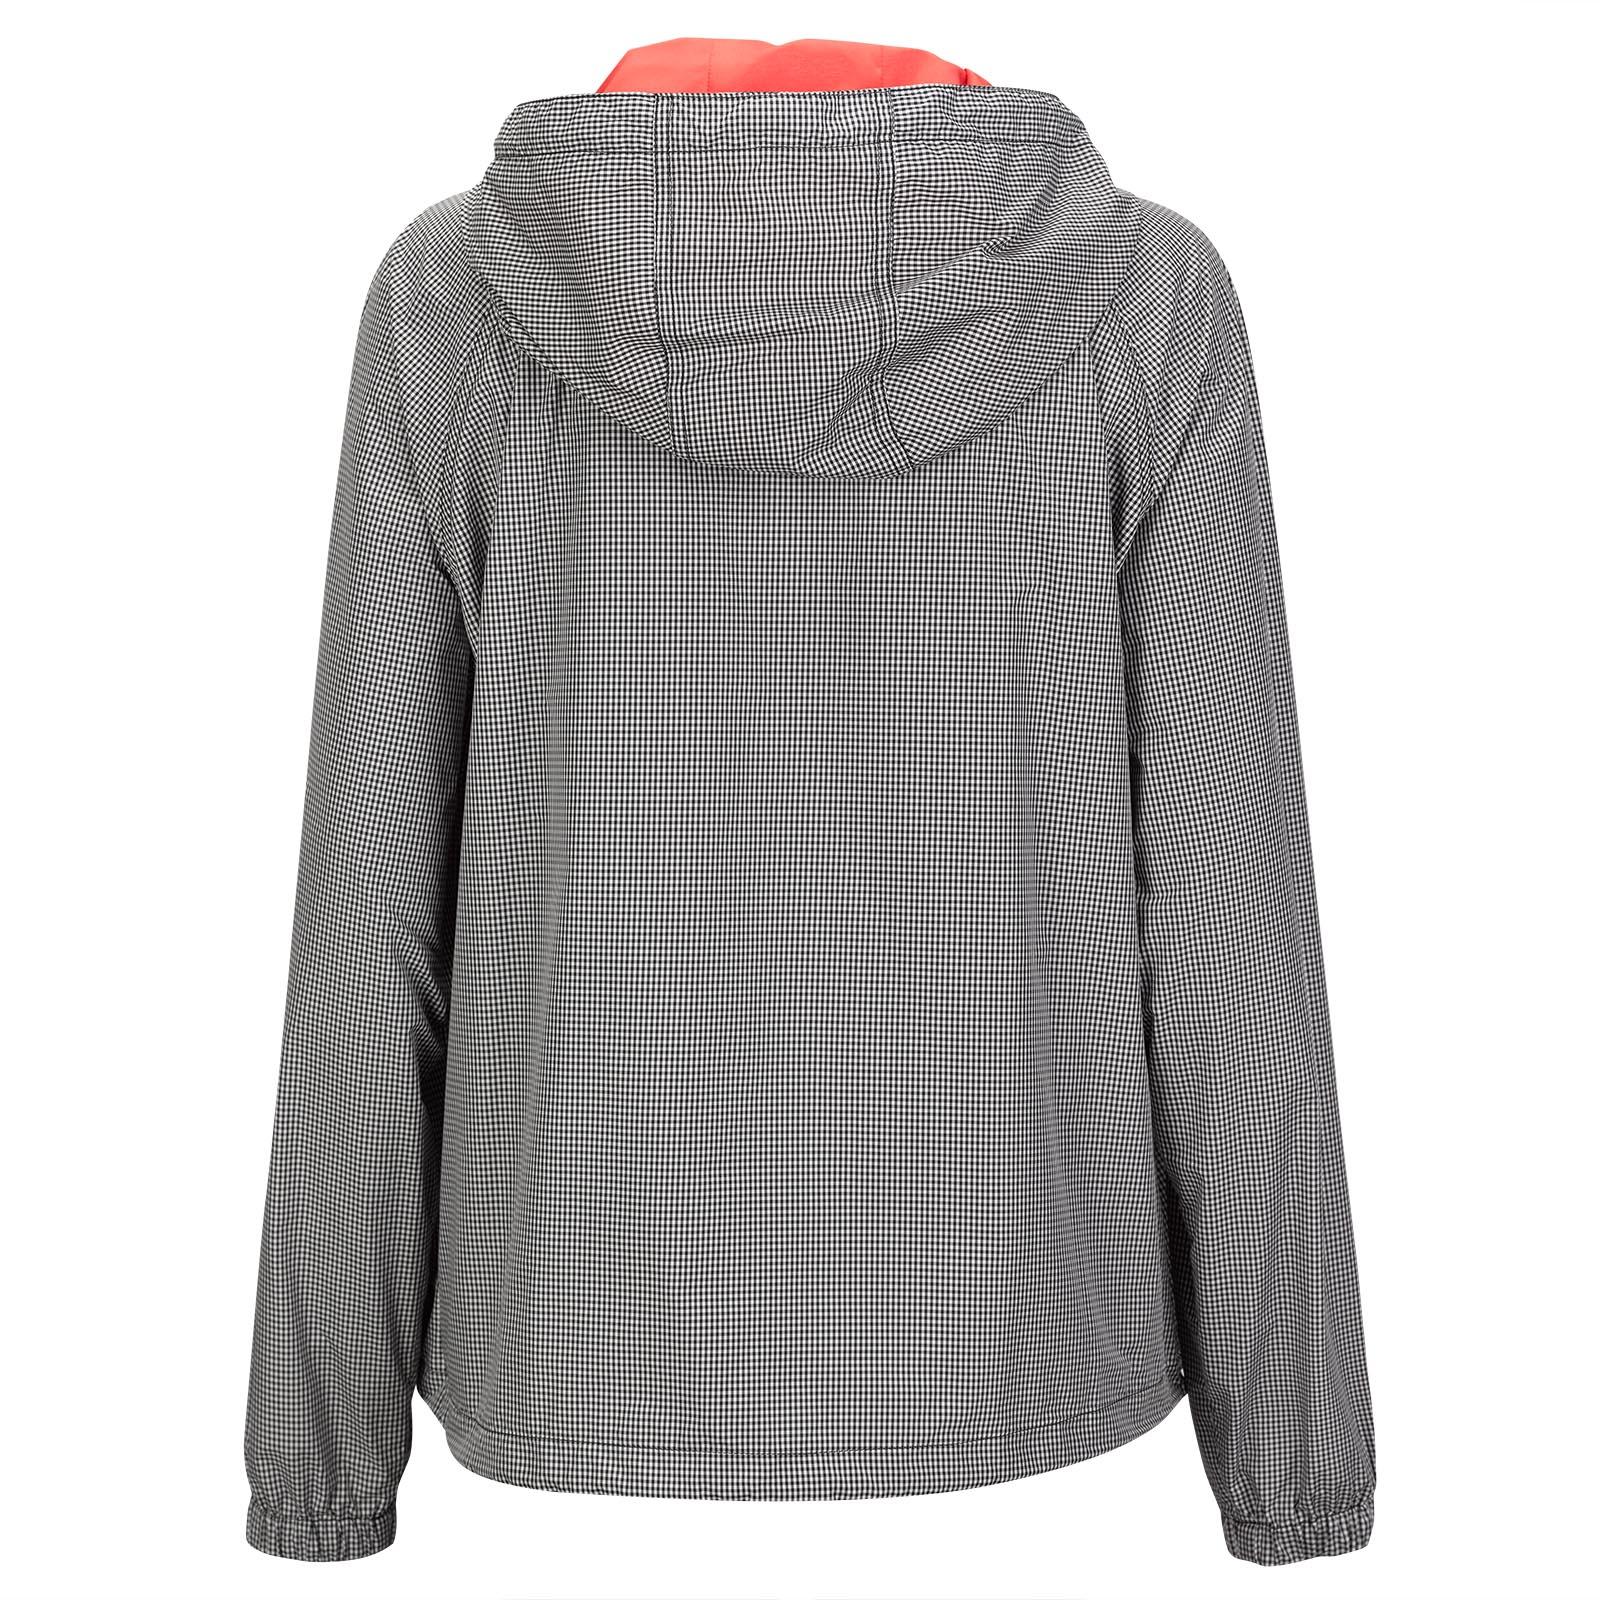 Wind Protection Damen Golfjacke mit Vichy Muster und Kapuze